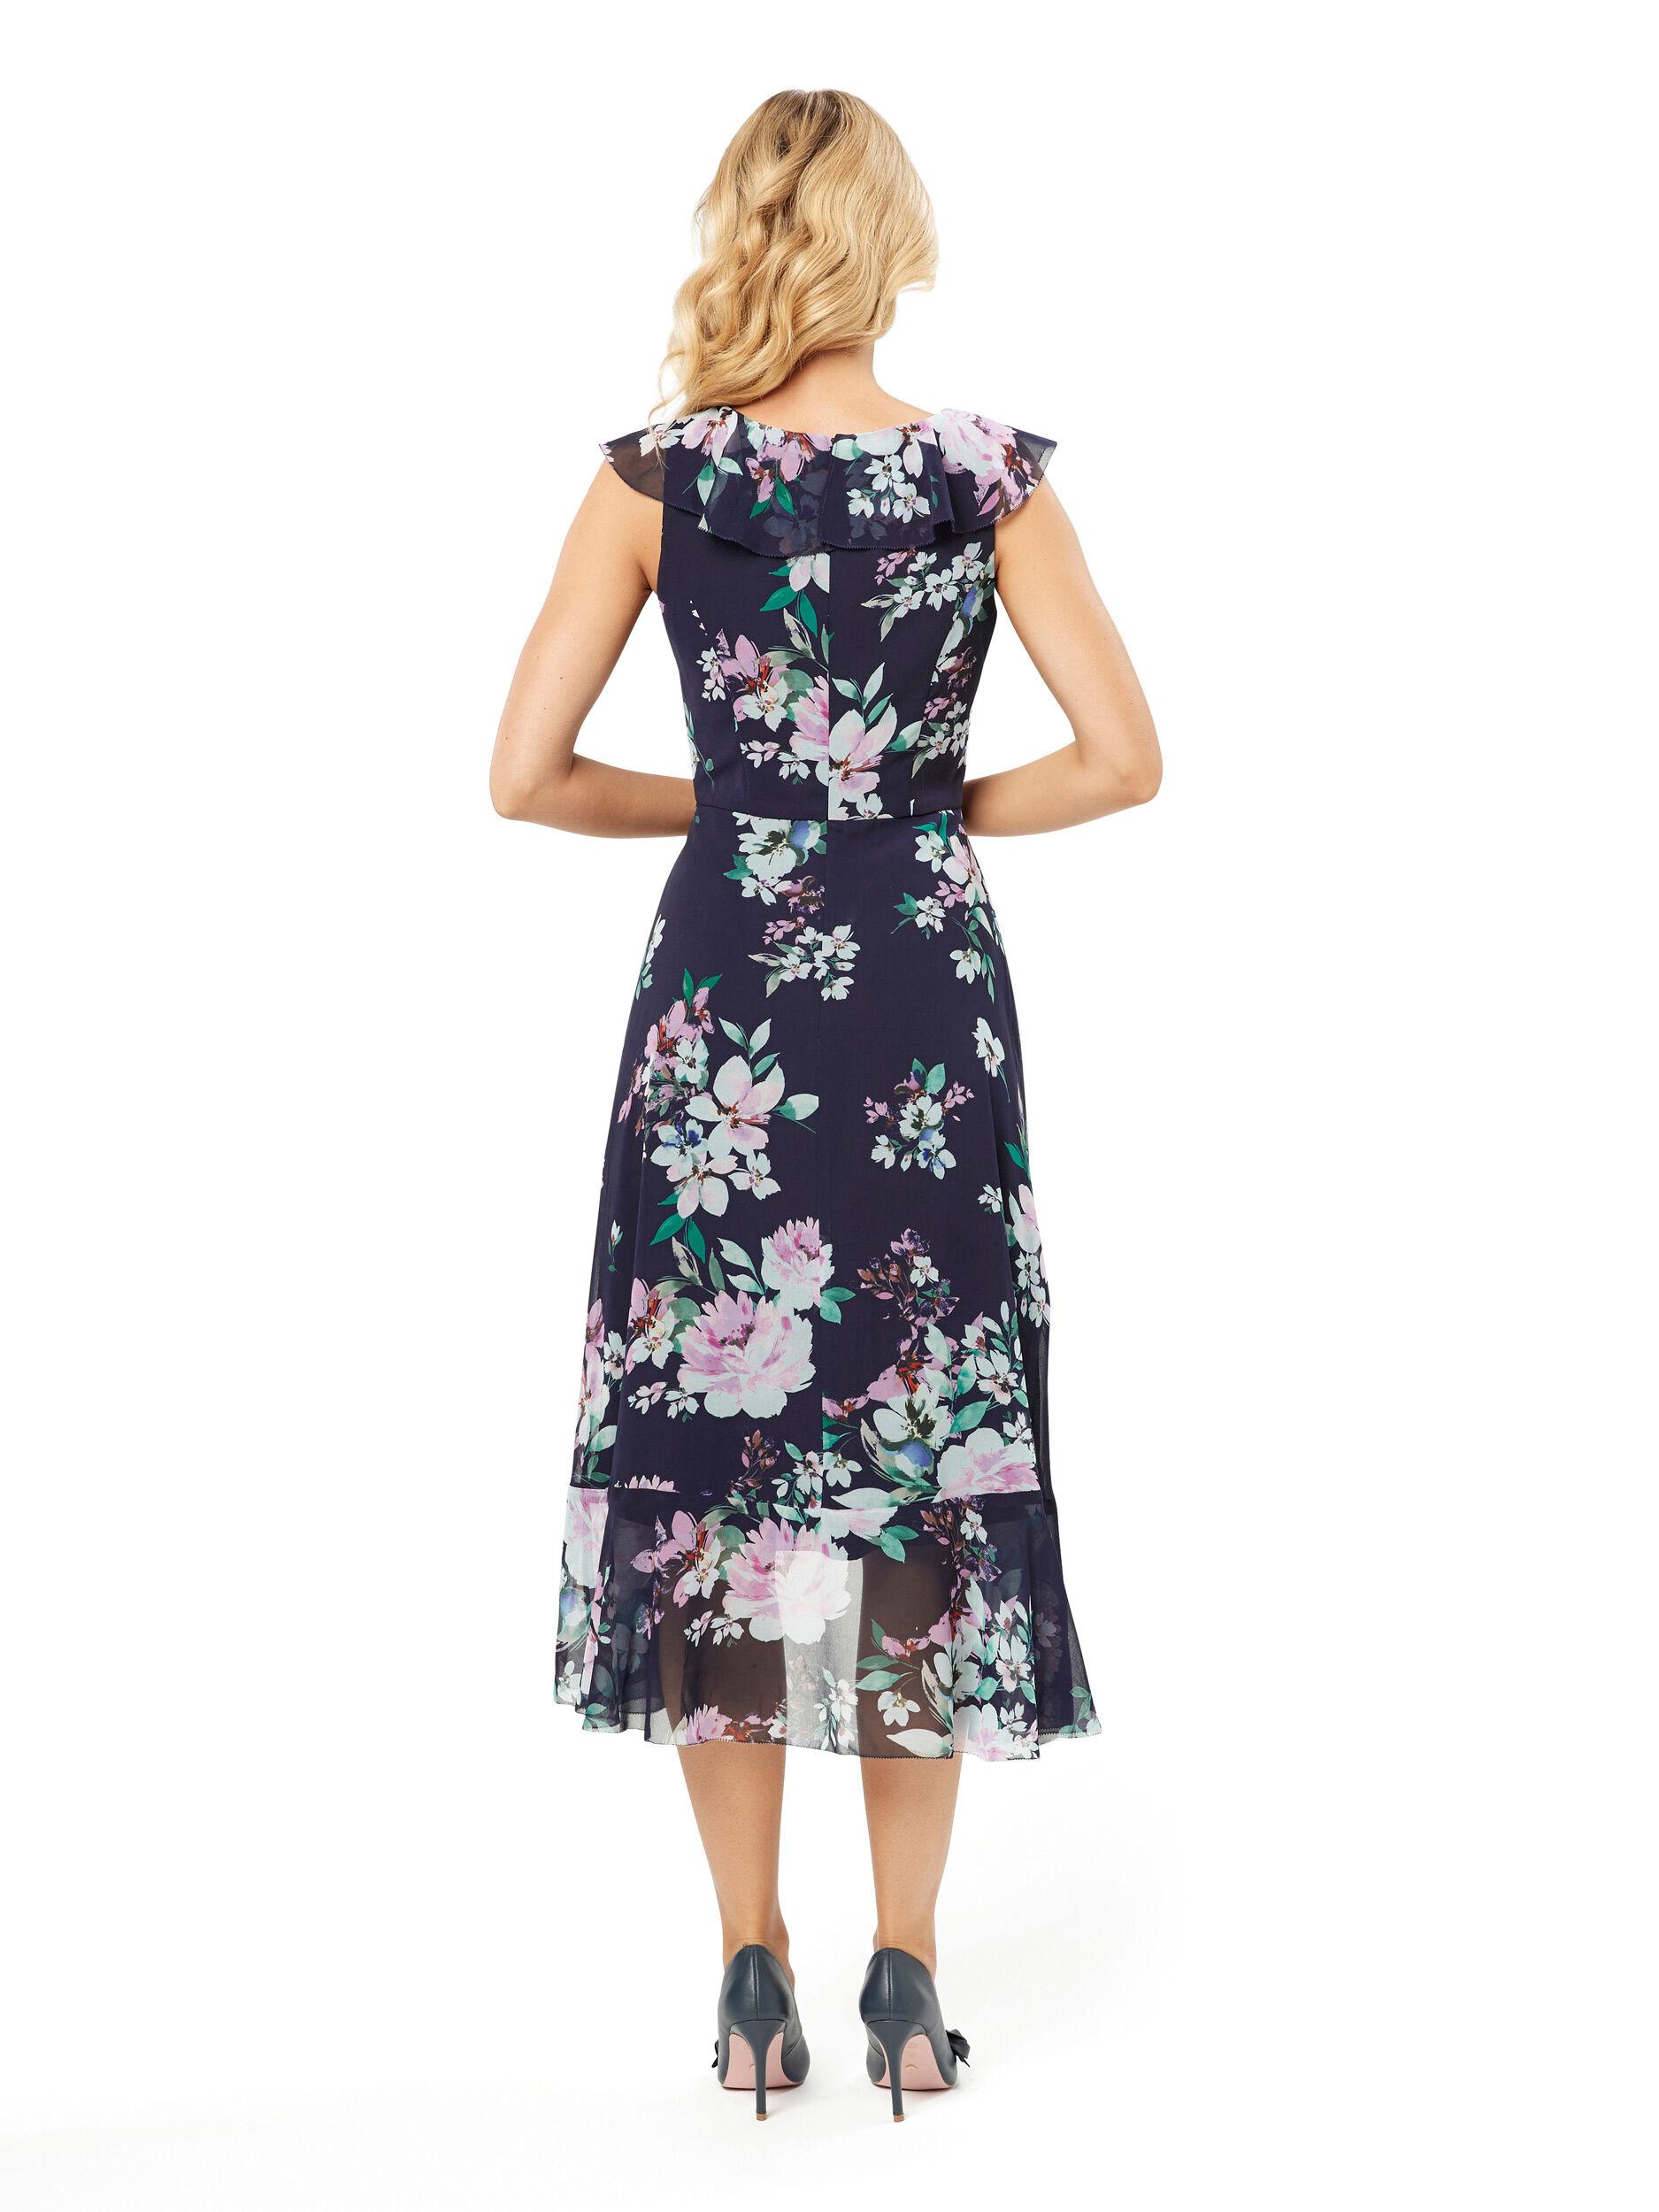 Peony Rose Dress